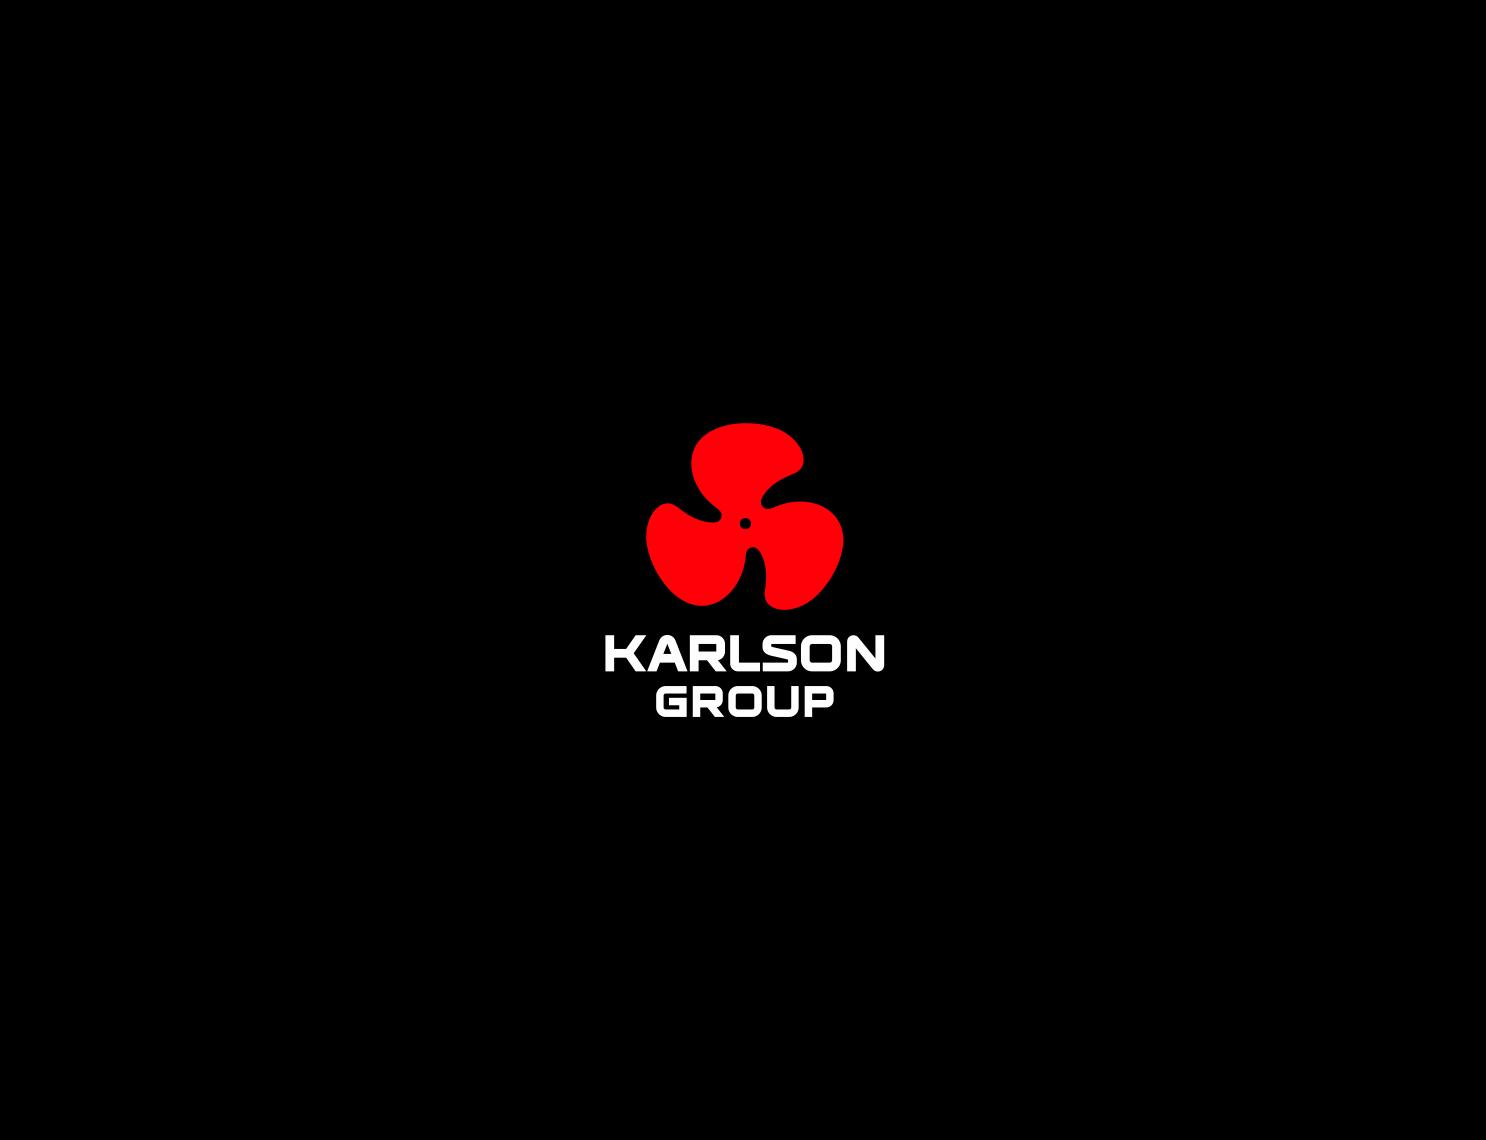 Придумать классный логотип фото f_5025986a93b3a3dd.png